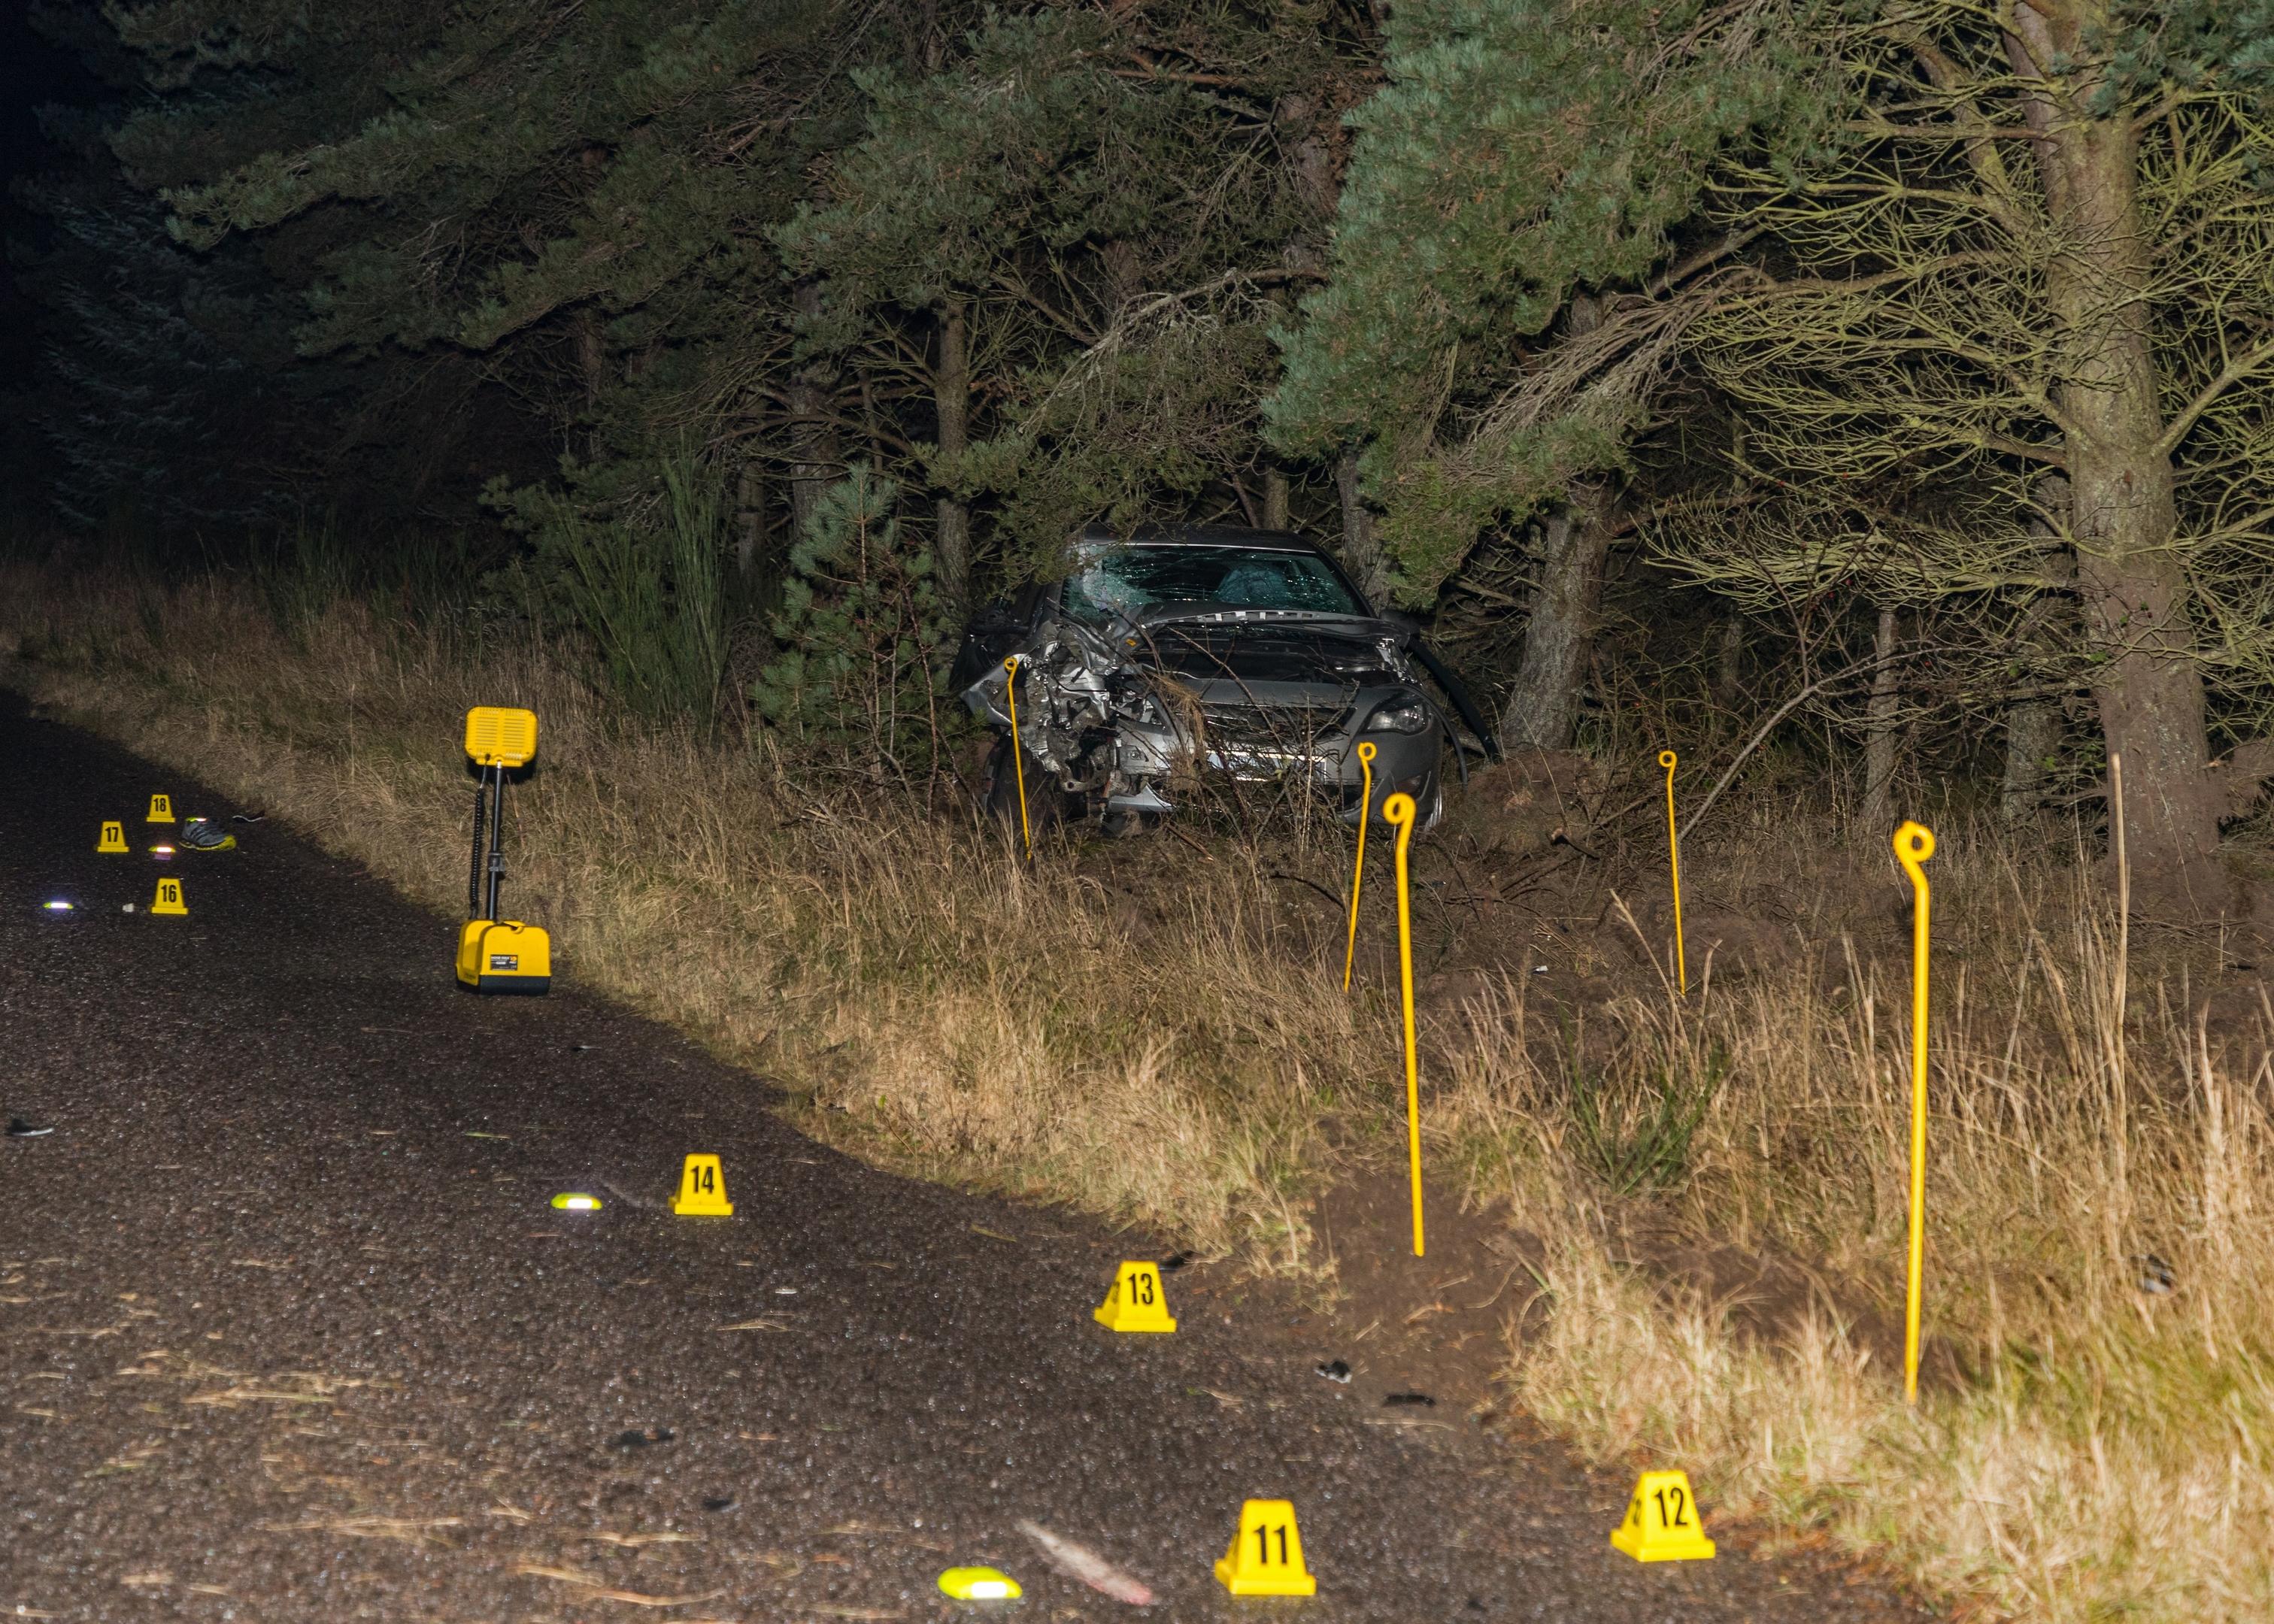 The scene of the fatal crash in Moray